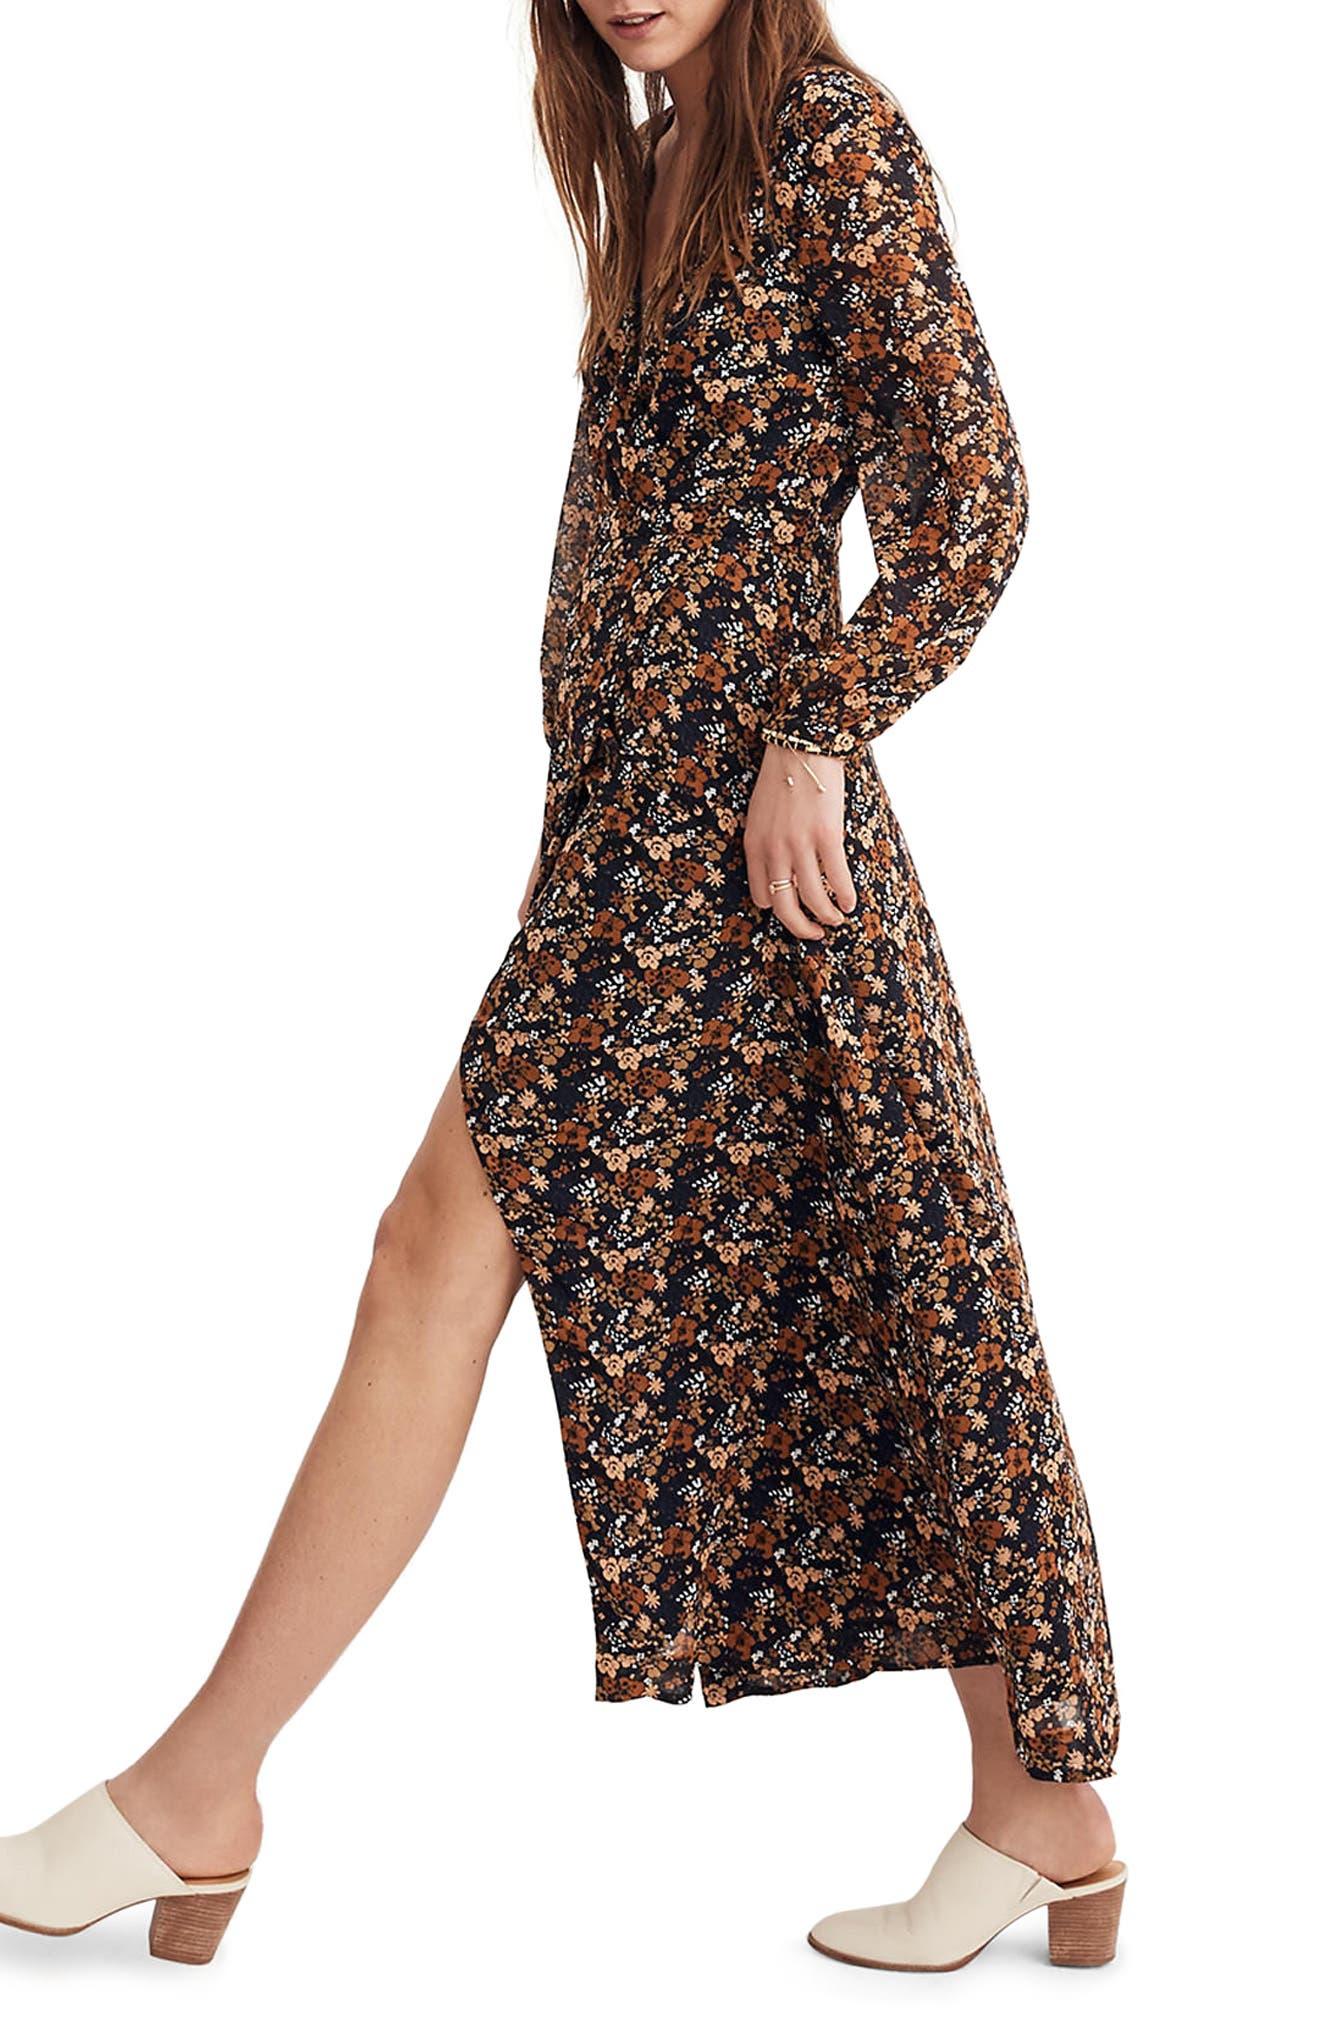 Nightflower Maxi Dress,                             Alternate thumbnail 2, color,                             200